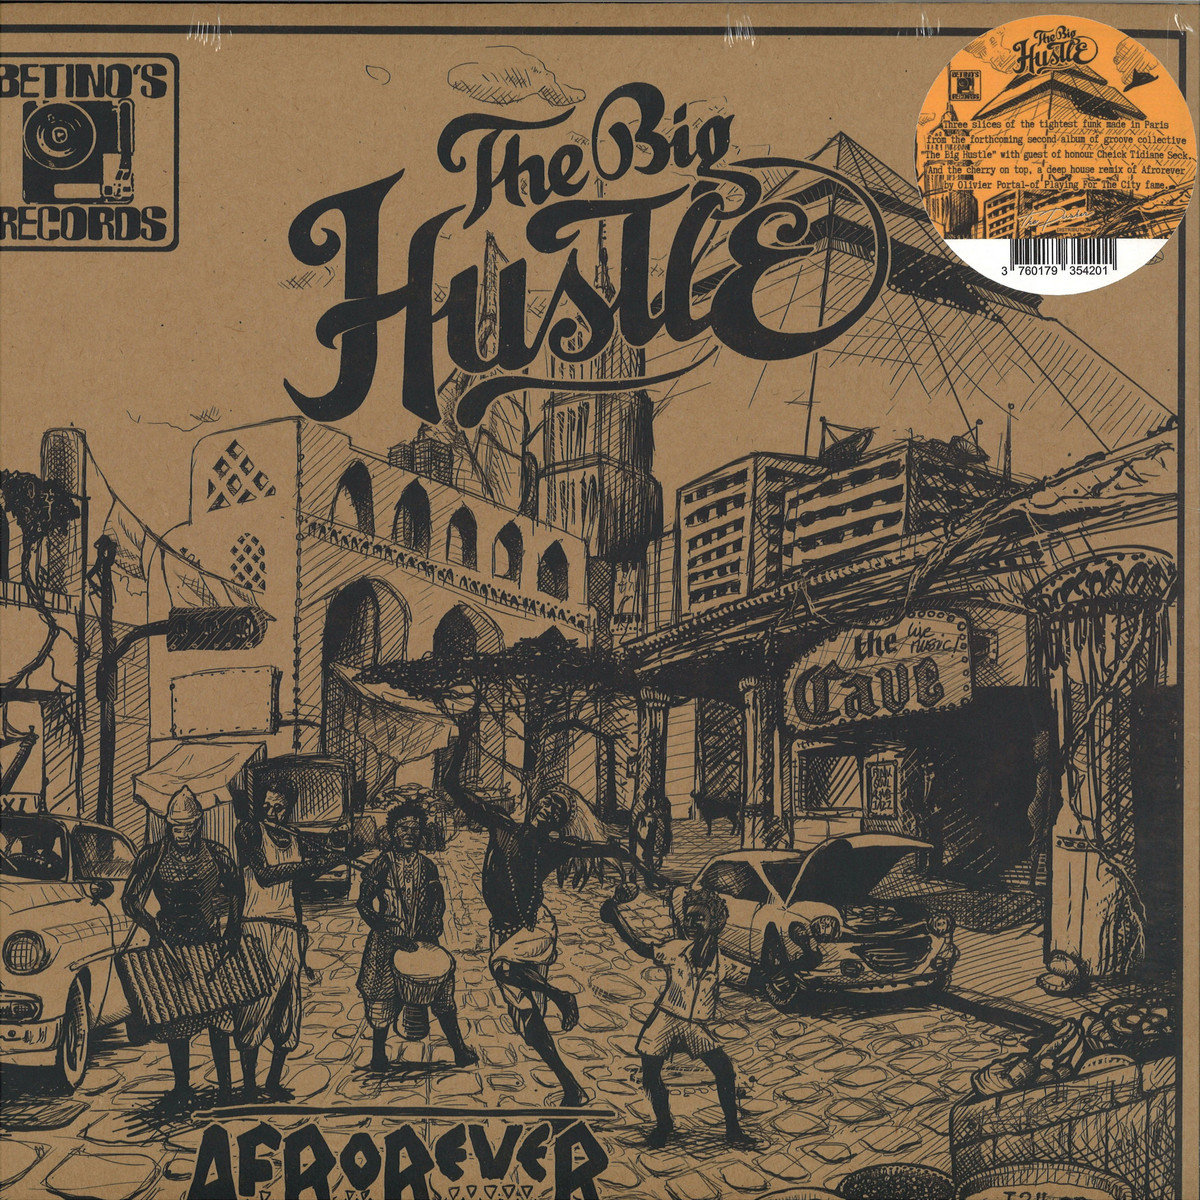 Enjoyable The Big Hustle Afrorever Betinos Records Br03Bet Vinyl Interior Design Ideas Oxytryabchikinfo